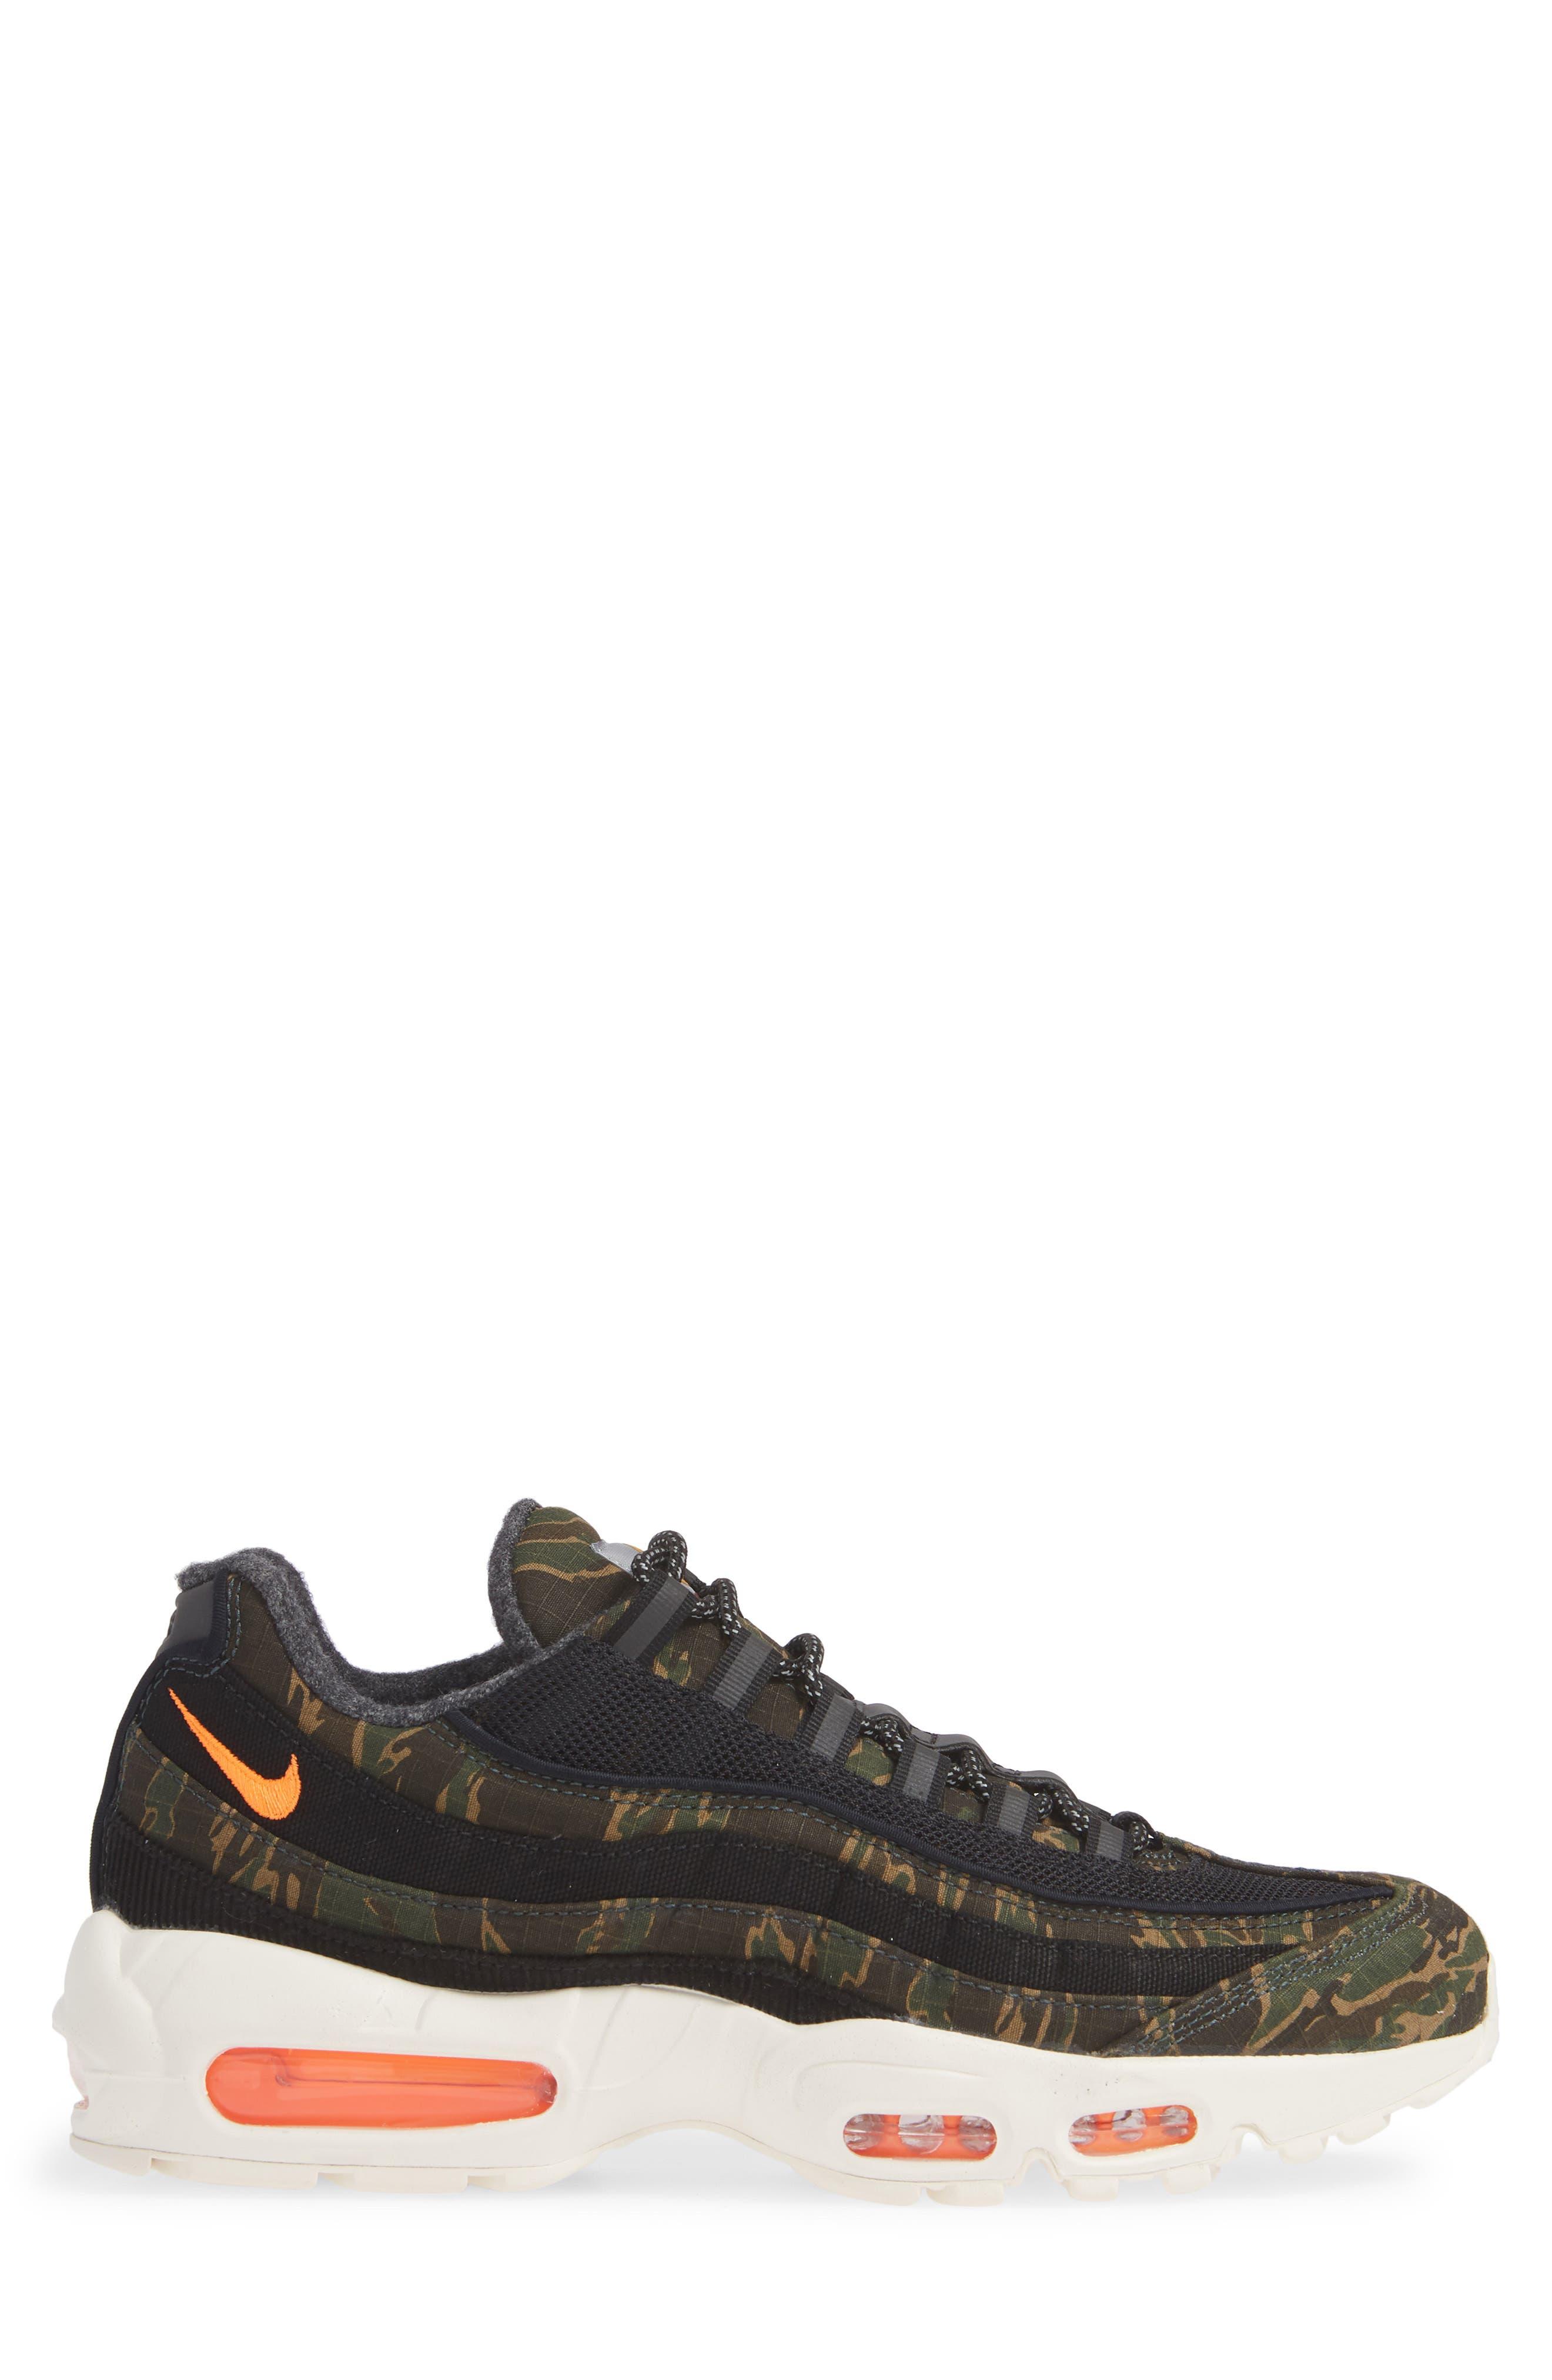 NIKE,                             x Carhartt Air Max 95 WIP Sneaker,                             Alternate thumbnail 3, color,                             001